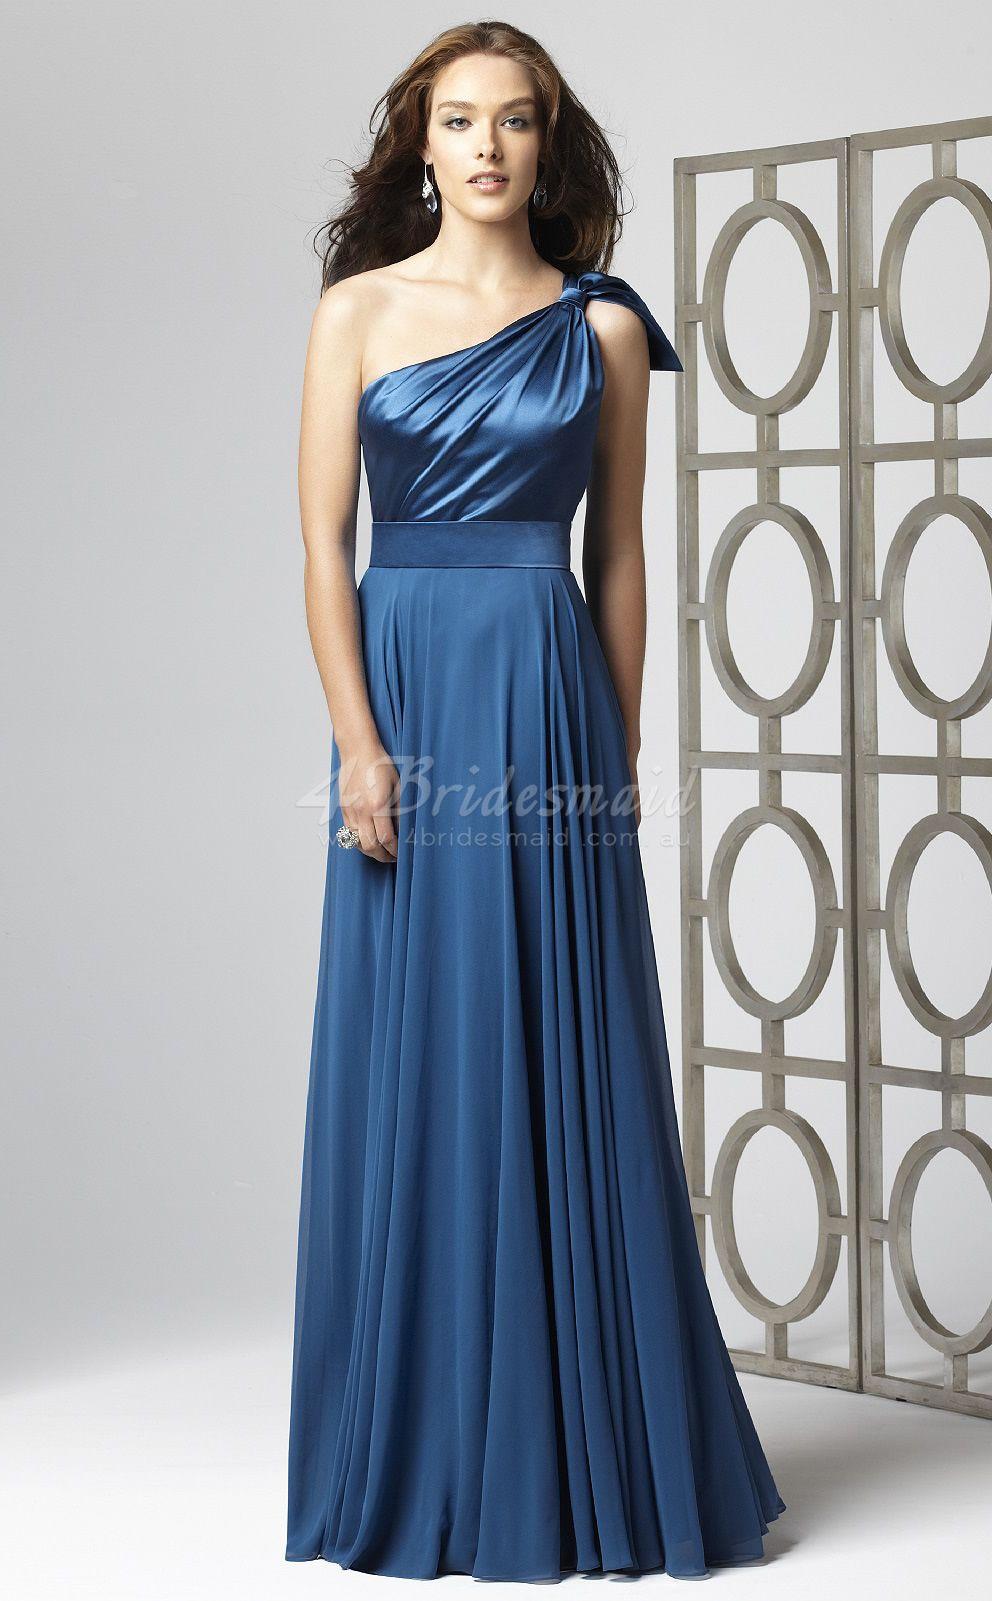 Royal blue chiffon charmeuse aline one shoulder floorlength